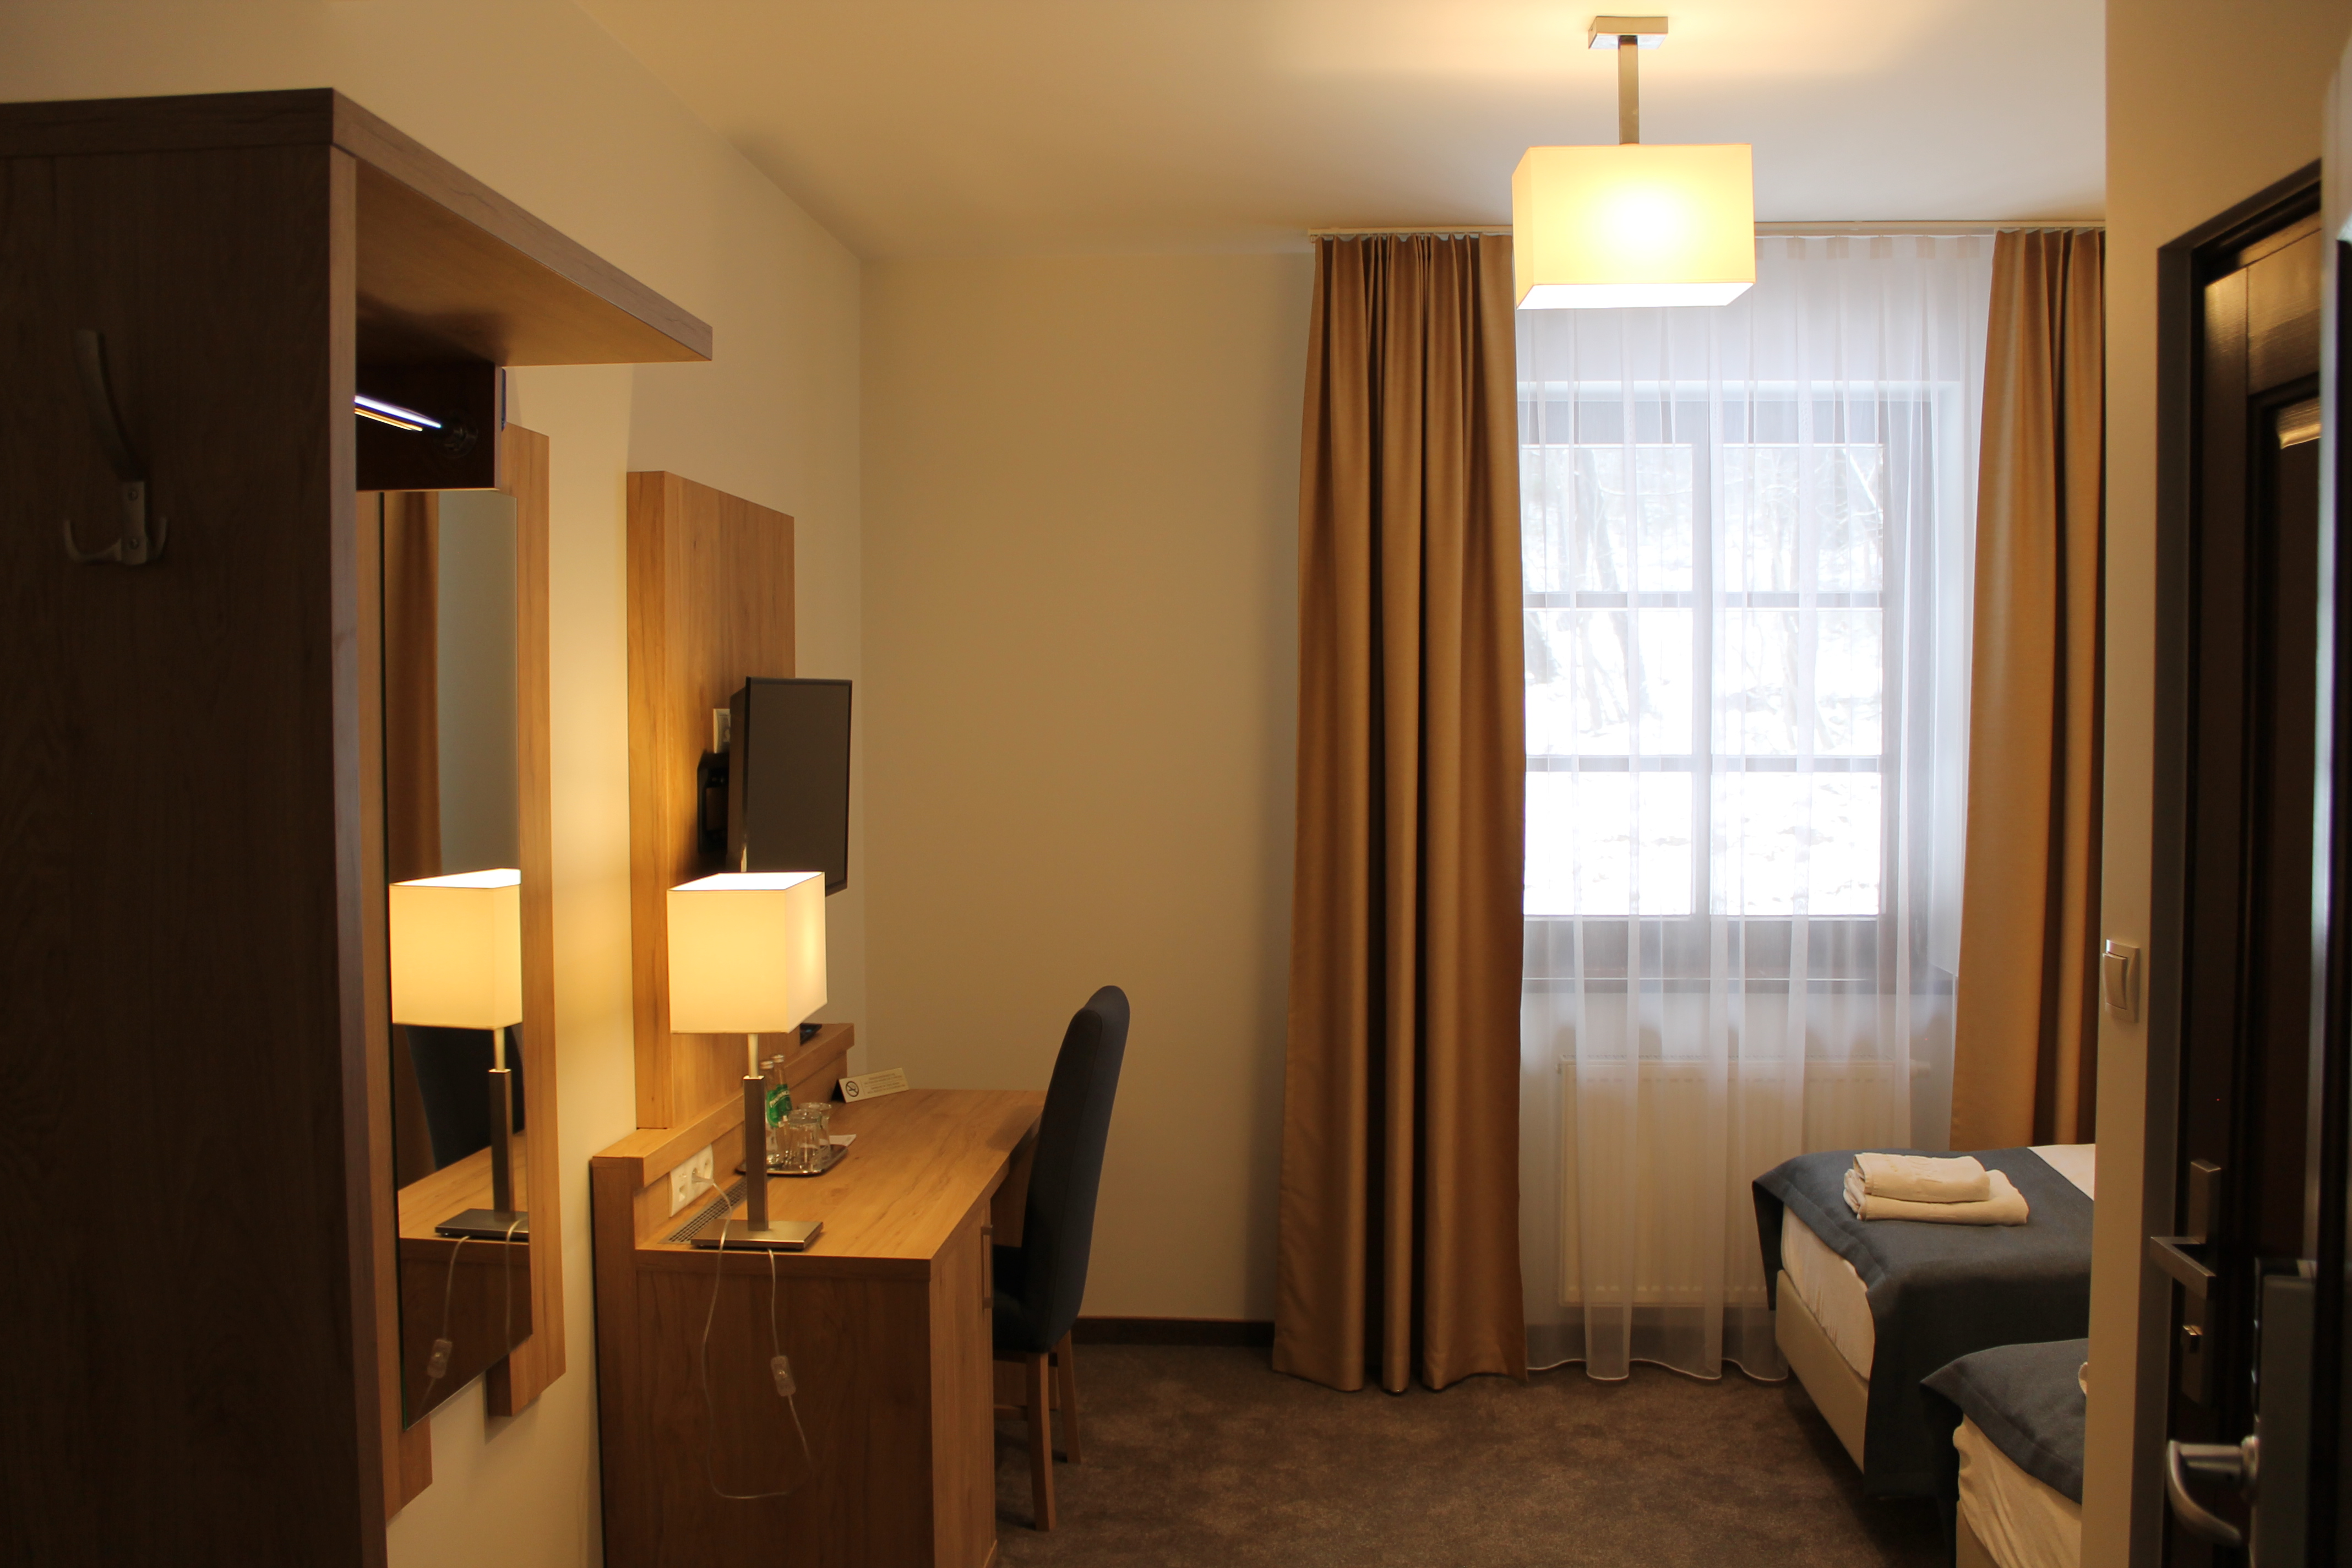 http://www.hotel-lipnica.pl/wp-content/uploads/2020/02/04_01.jpg